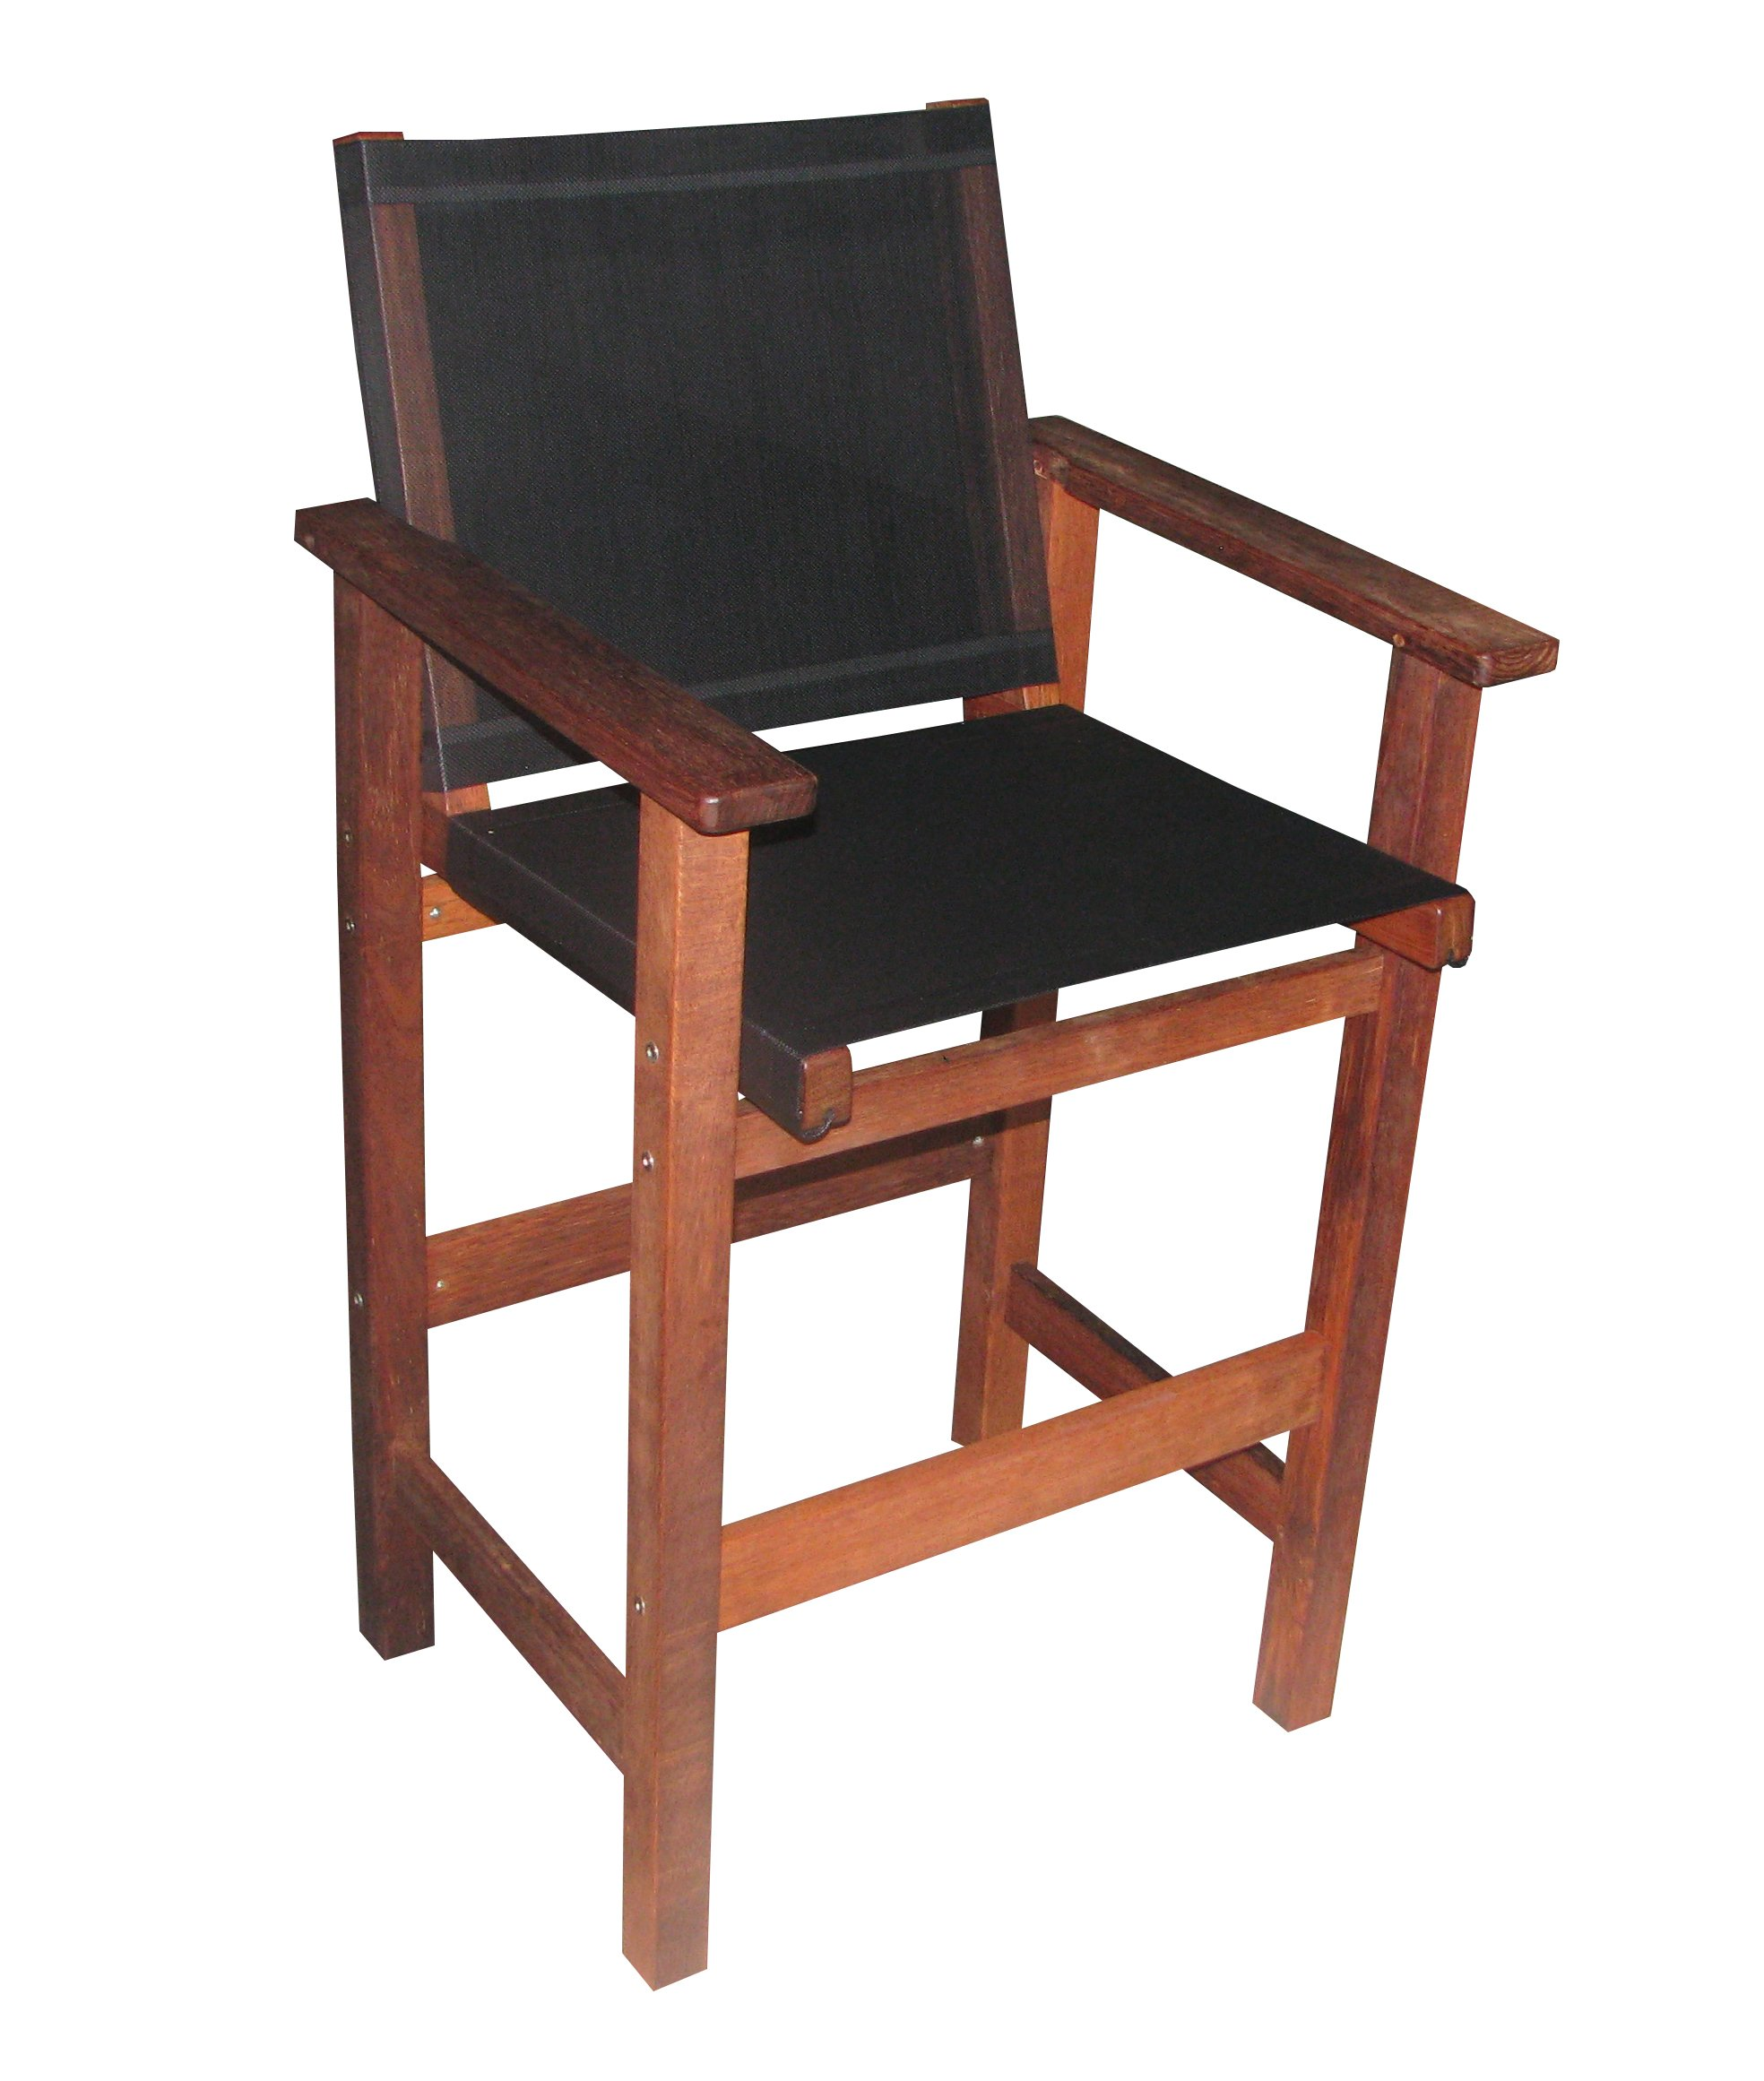 KWILA SLING BAR CHAIR Daydream Leisure Furniture : Kwila sling bar chair from www.daydreamleisure.com.au size 1968 x 2322 jpeg 1244kB